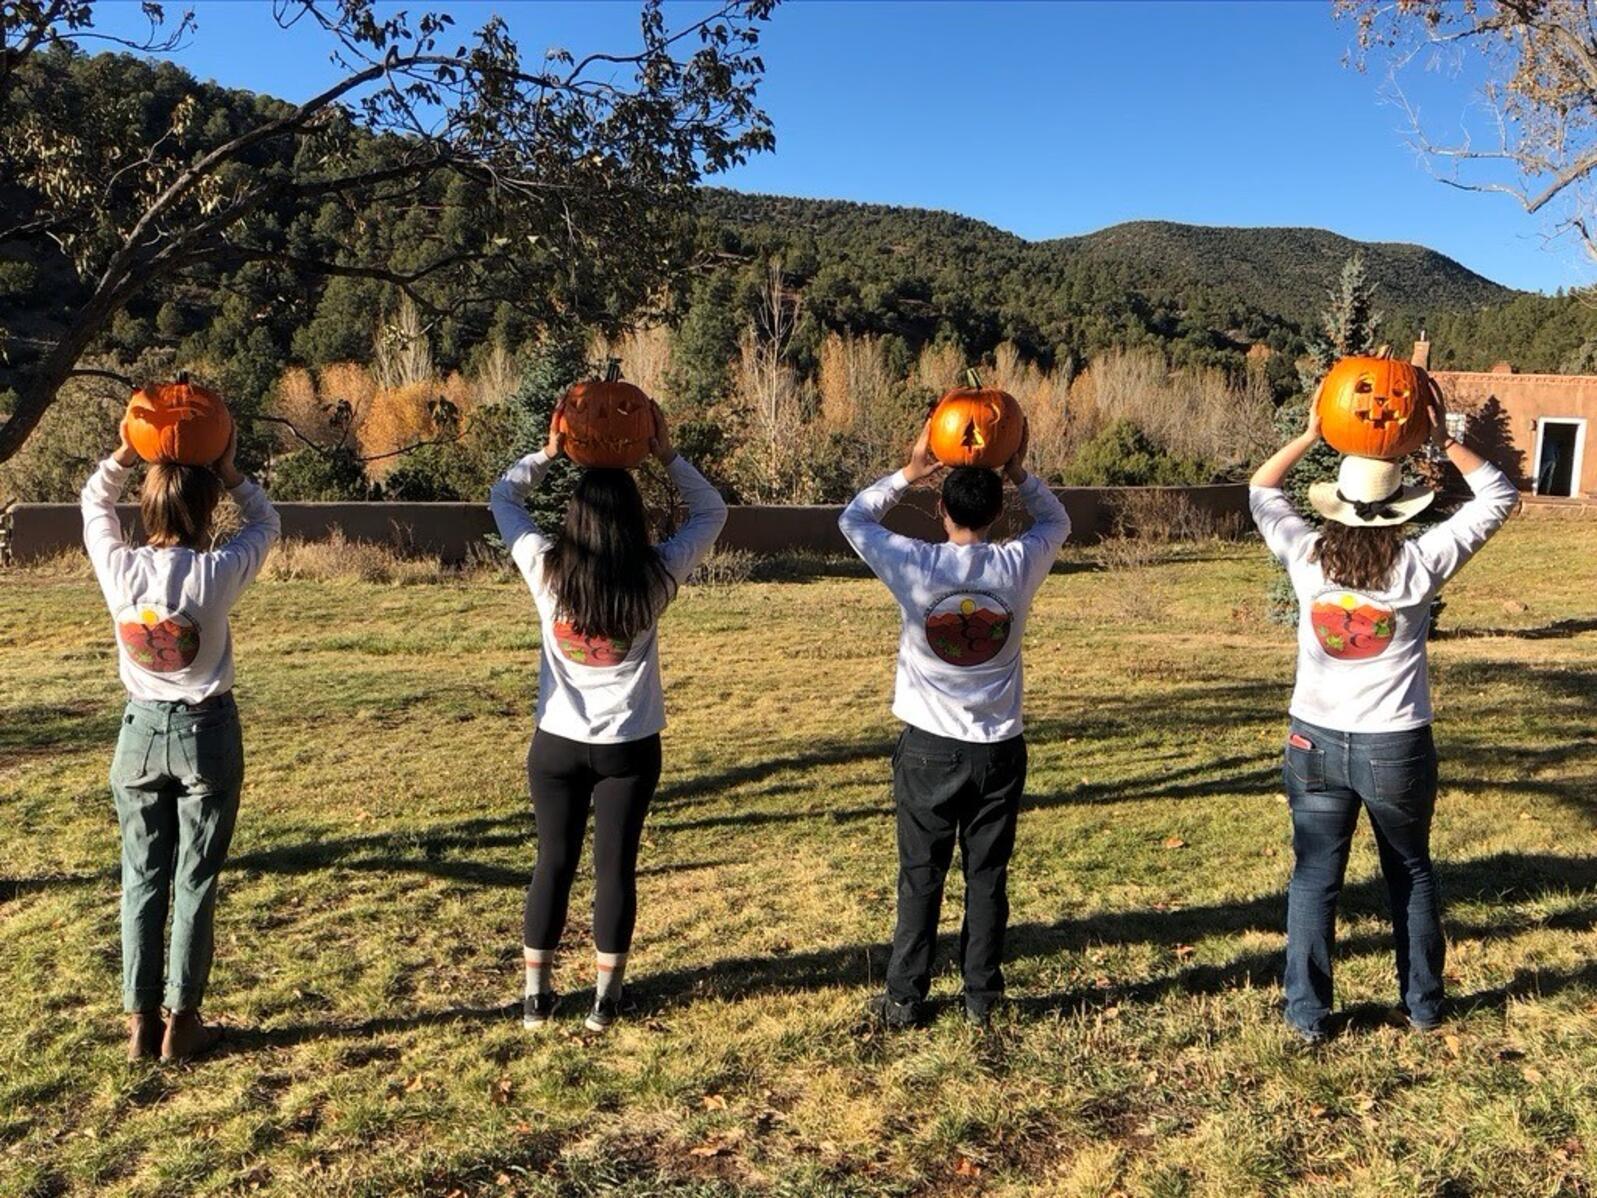 YCC crew with jack-o-lanterns